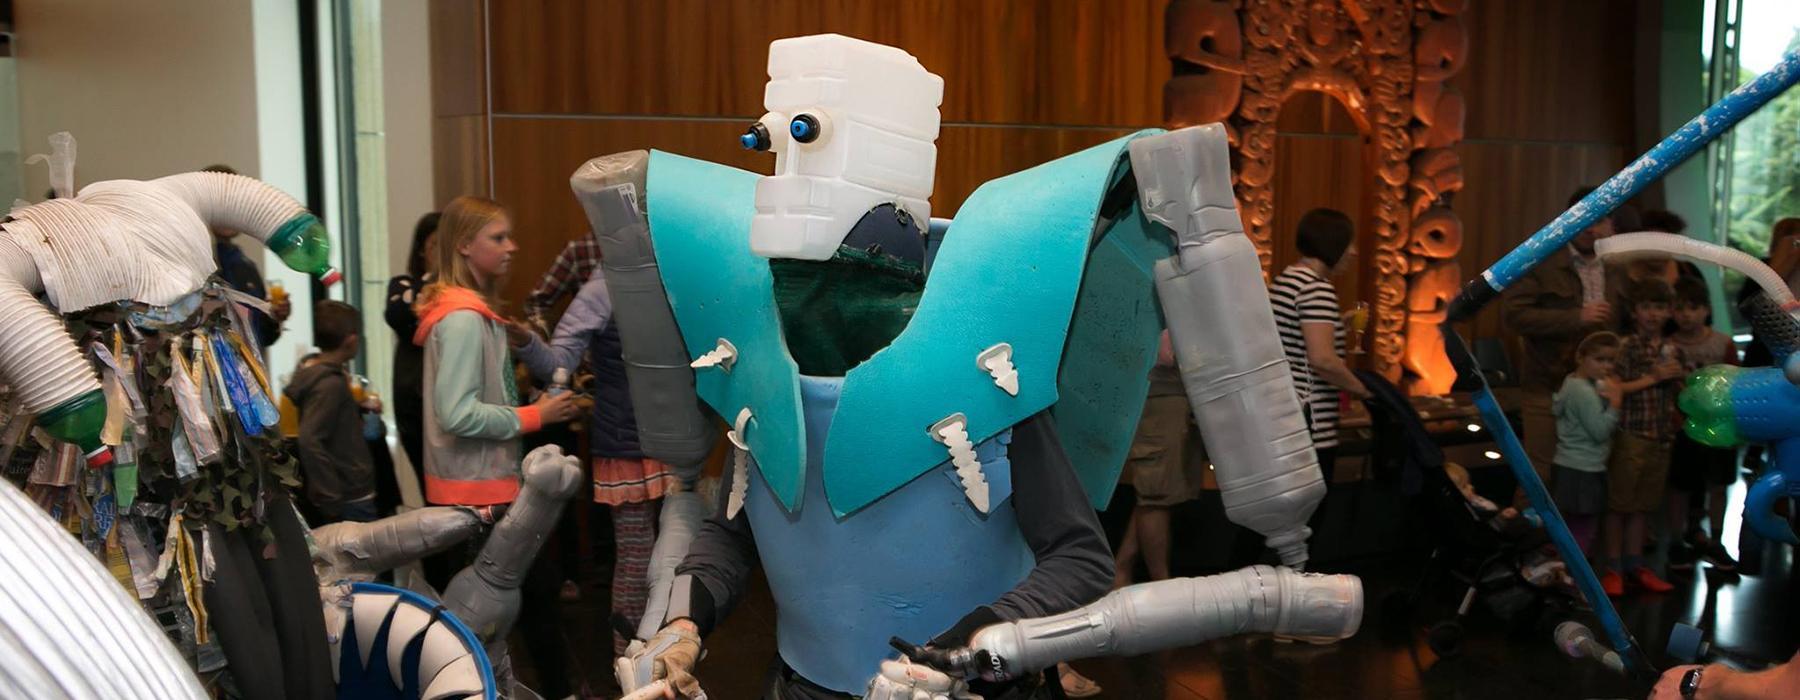 Alien Junk Monsters performing at Te Papa